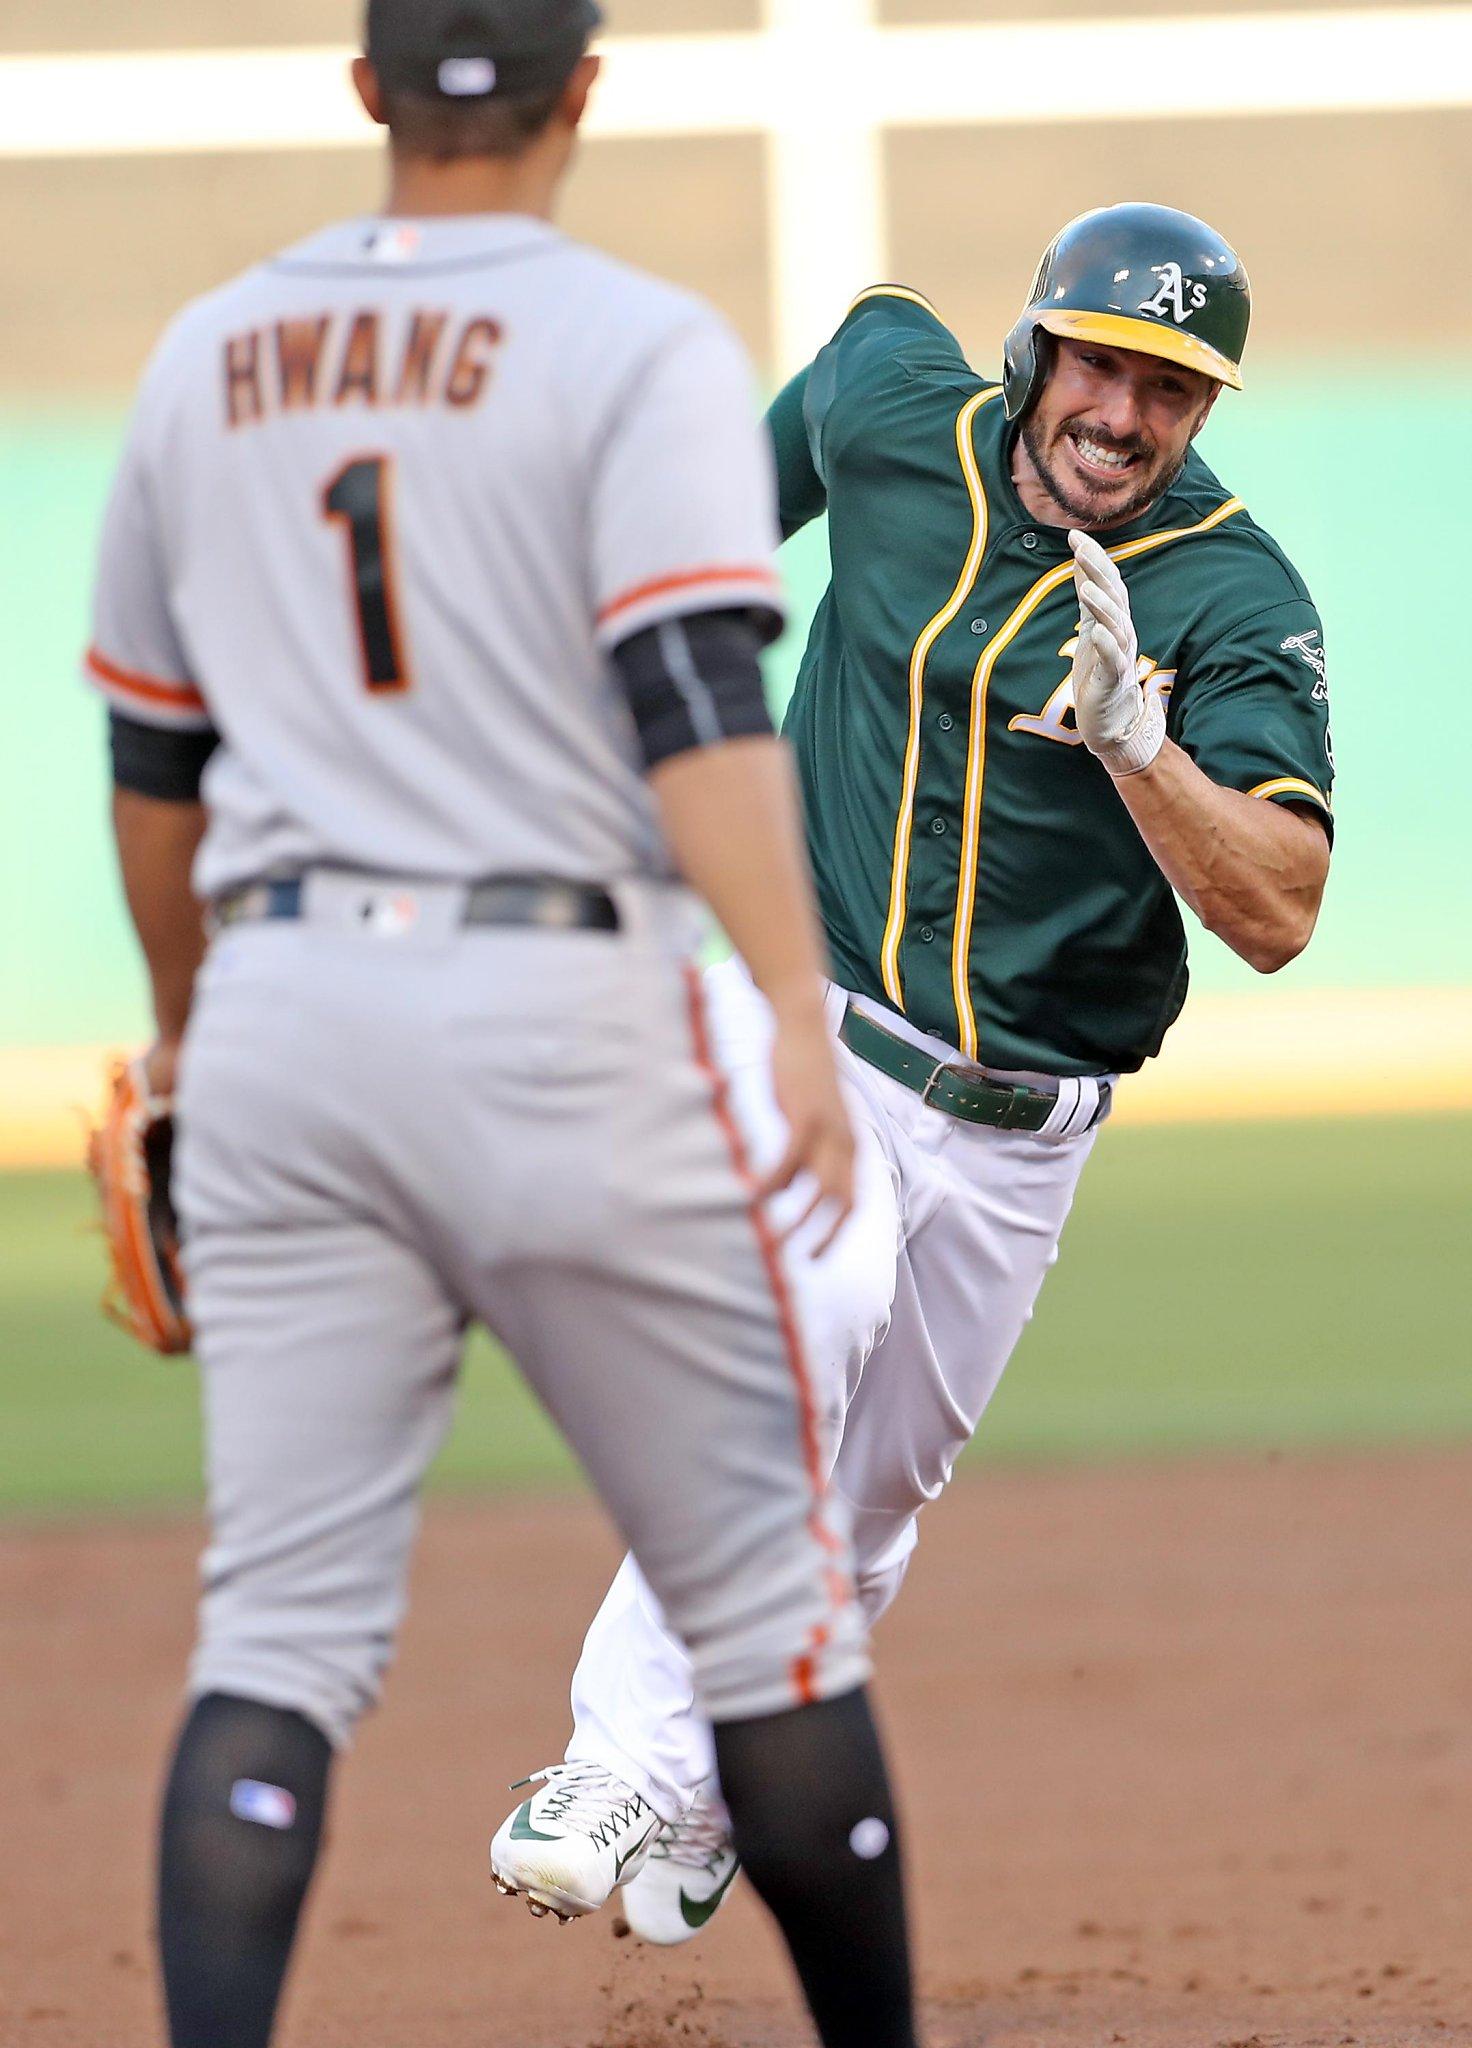 Major League Baseball Umpire Comes Out As Gay